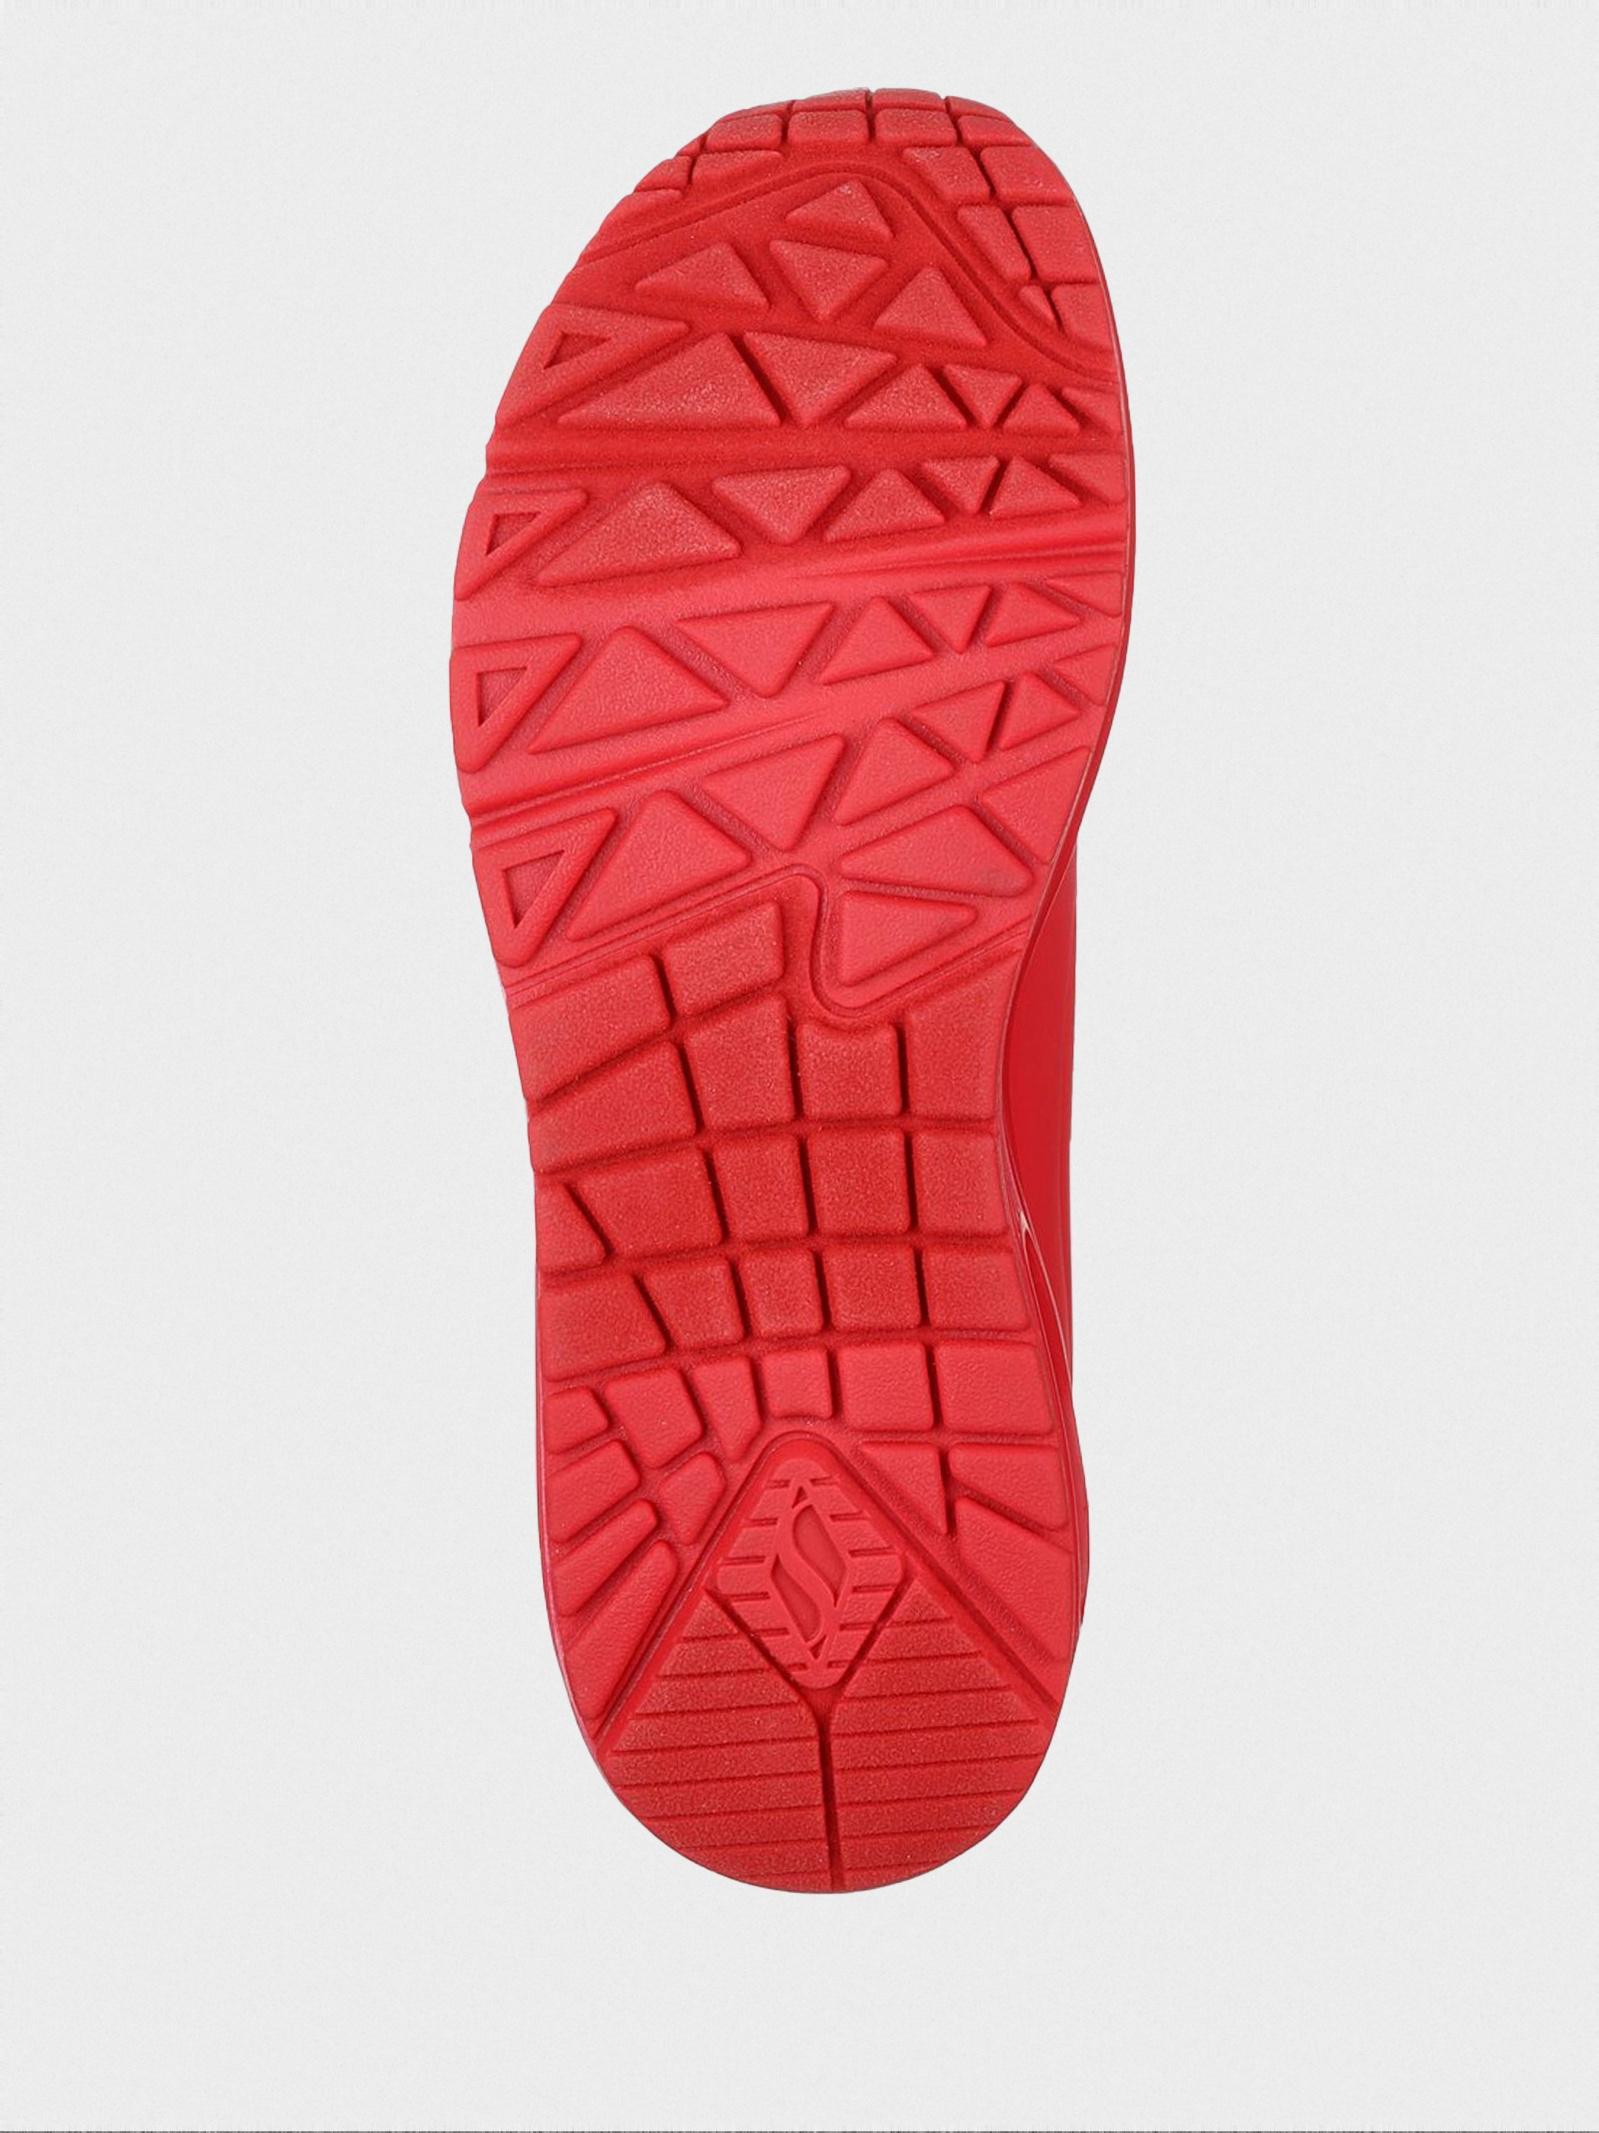 Кроссовки для женщин Skechers KW5406 , 2017